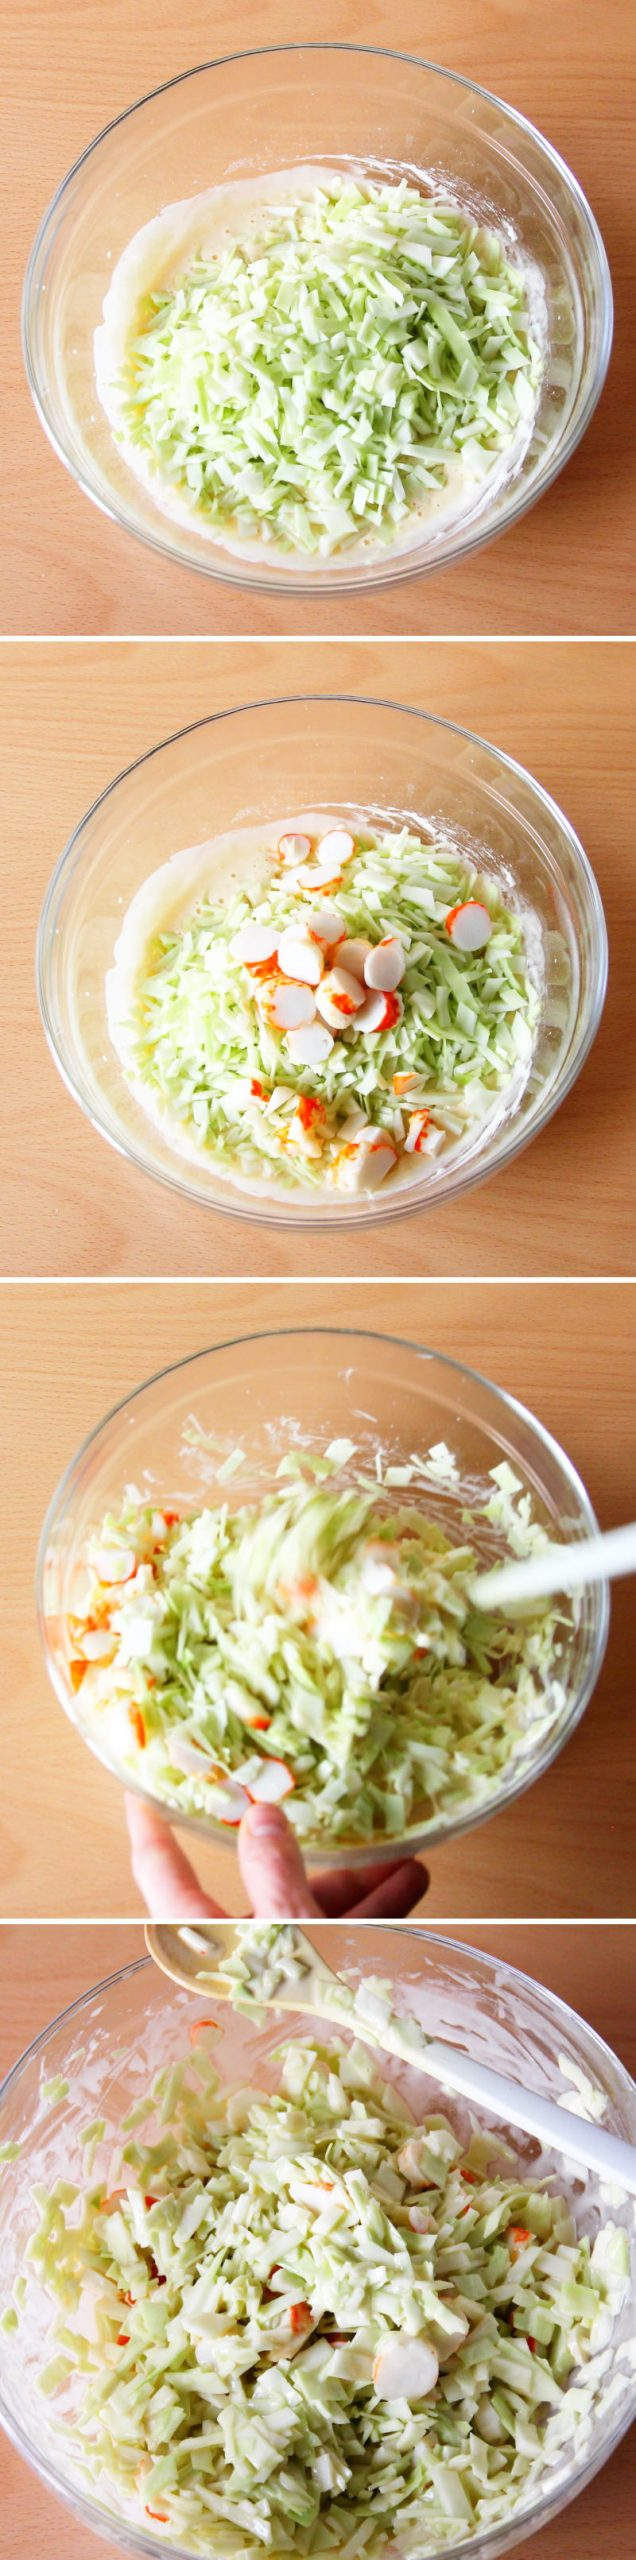 Grundrezept Okonomiyaki Schritt 5 Teig herstellen